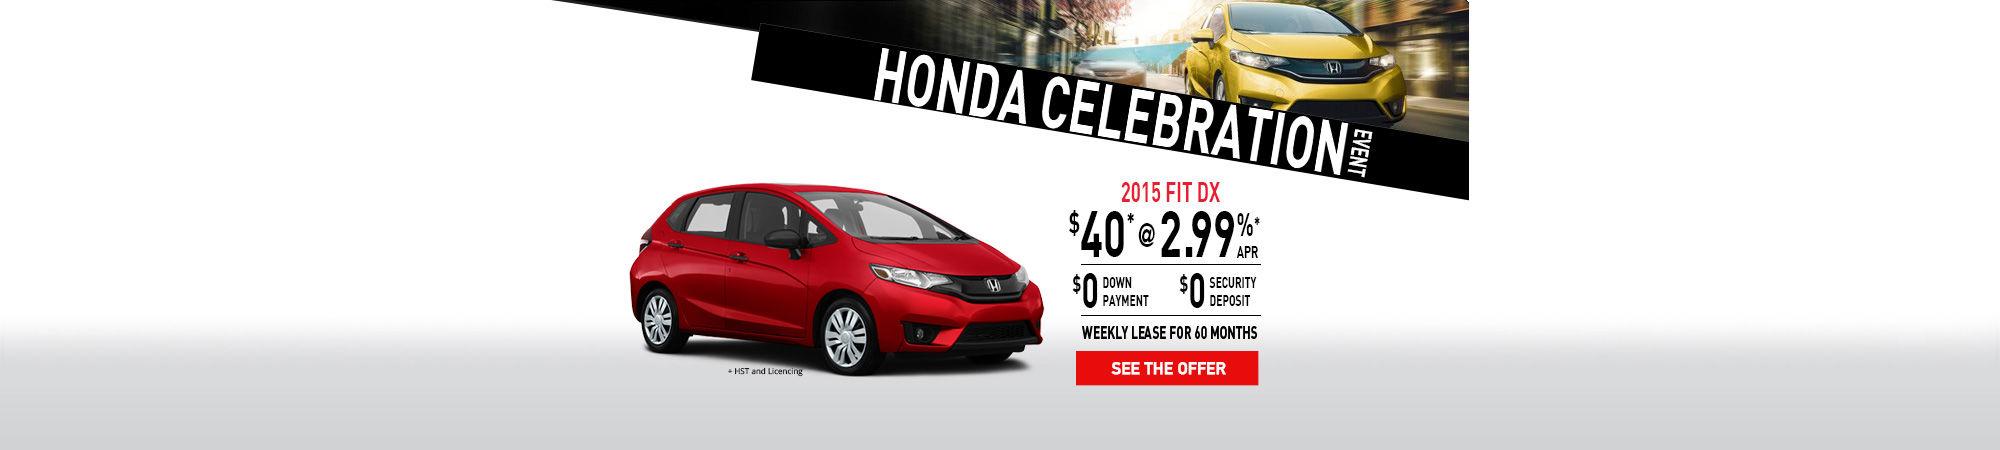 Honda Celebration -2015 Honda FIT-February